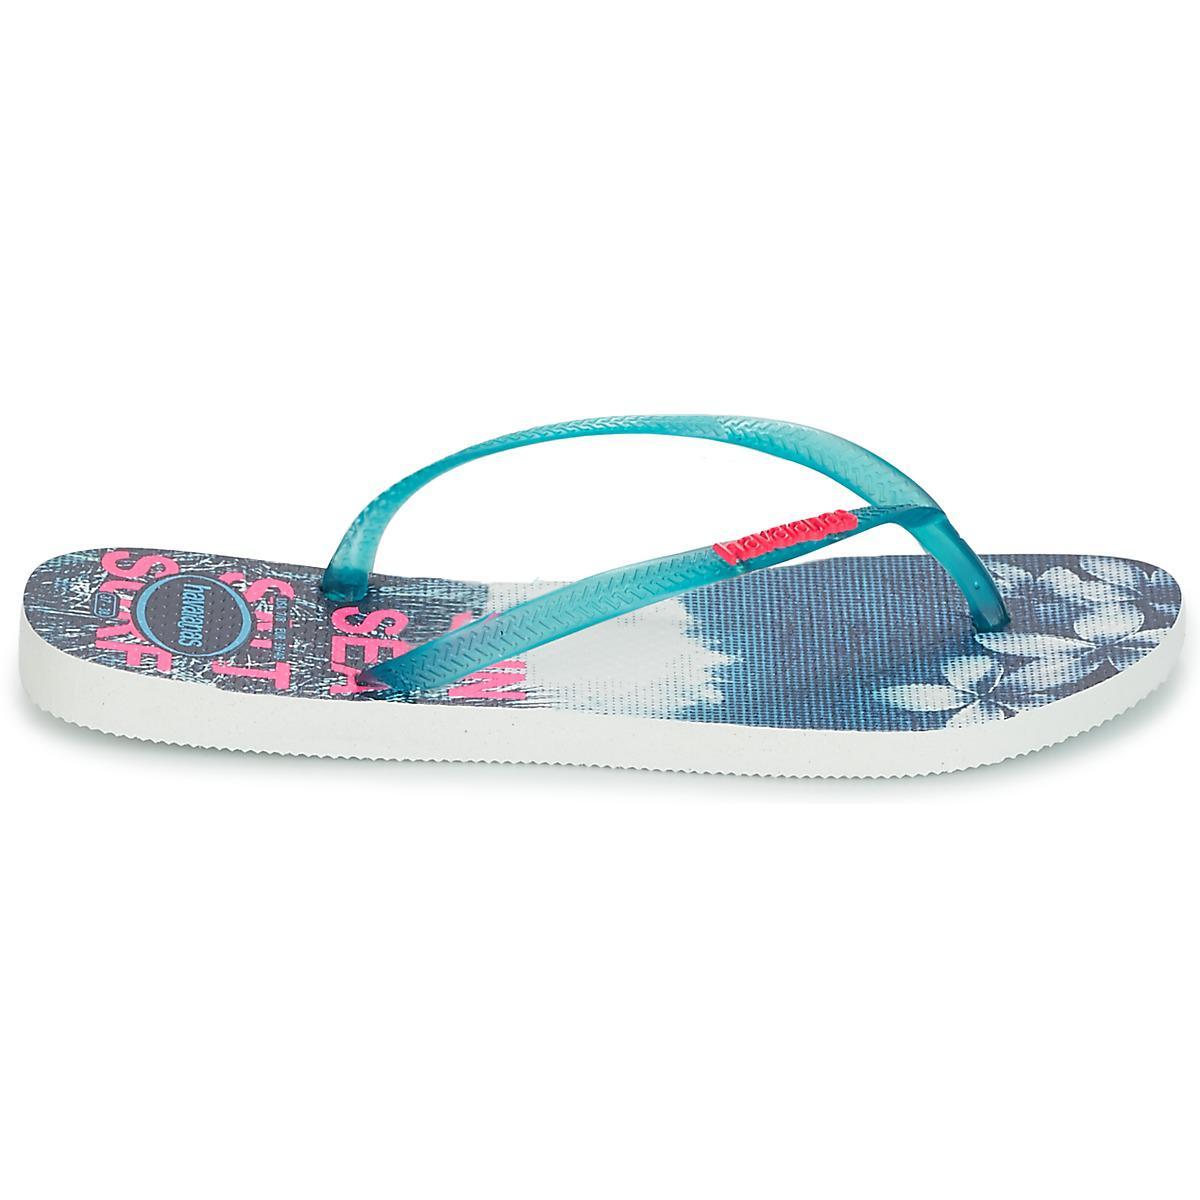 be63d66a7a2a Havaianas Slim Paisage Flip Flops   Sandals (shoes) in Blue - Lyst